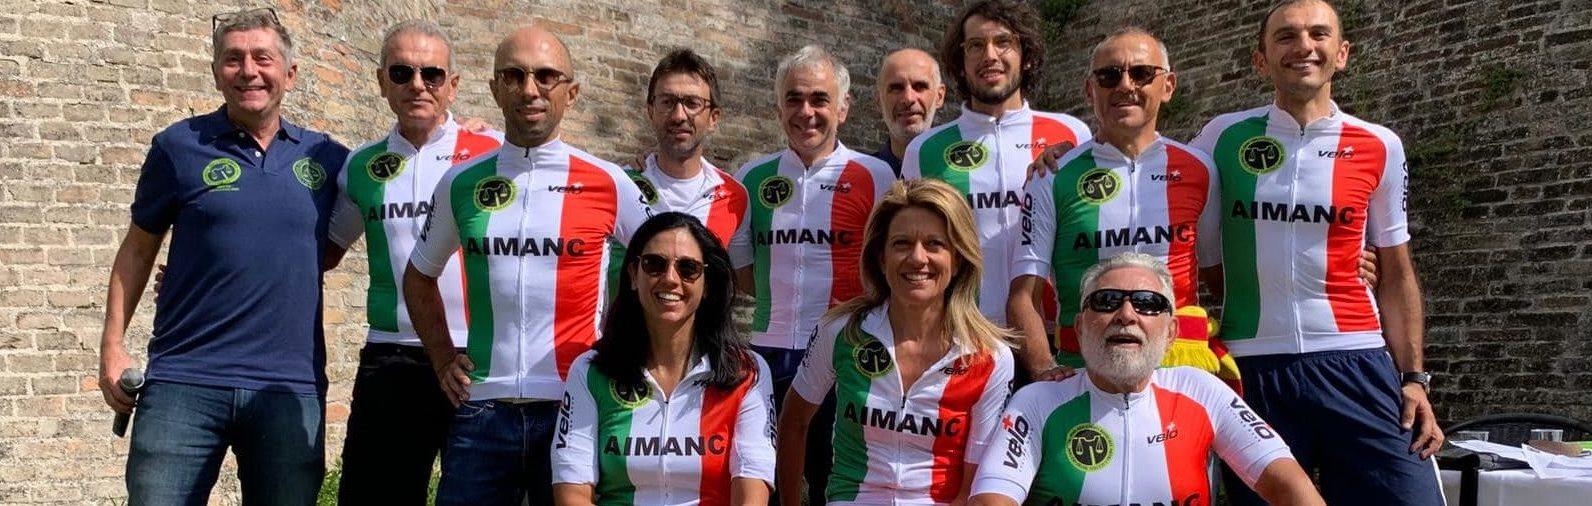 I Campioni d'Italia Aimanc 2019 Gara in Linea – URBINO